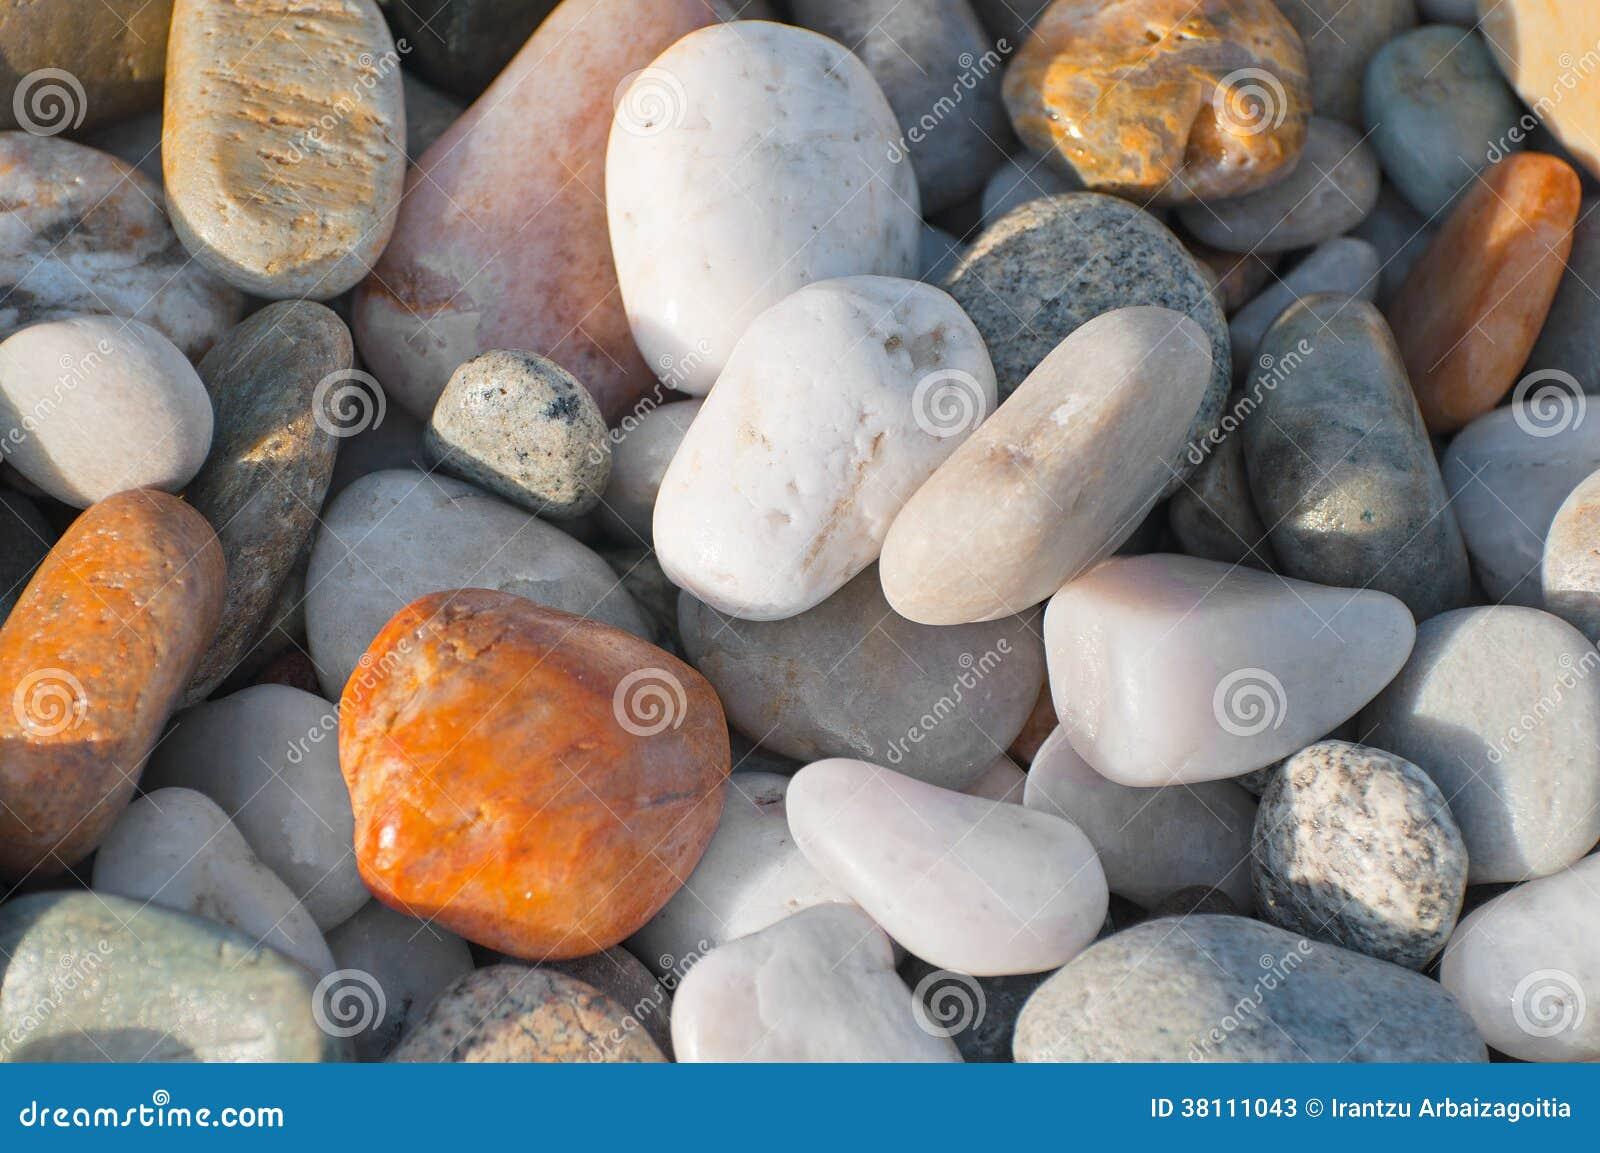 Камни предпосылка реки или пляжа, текстура